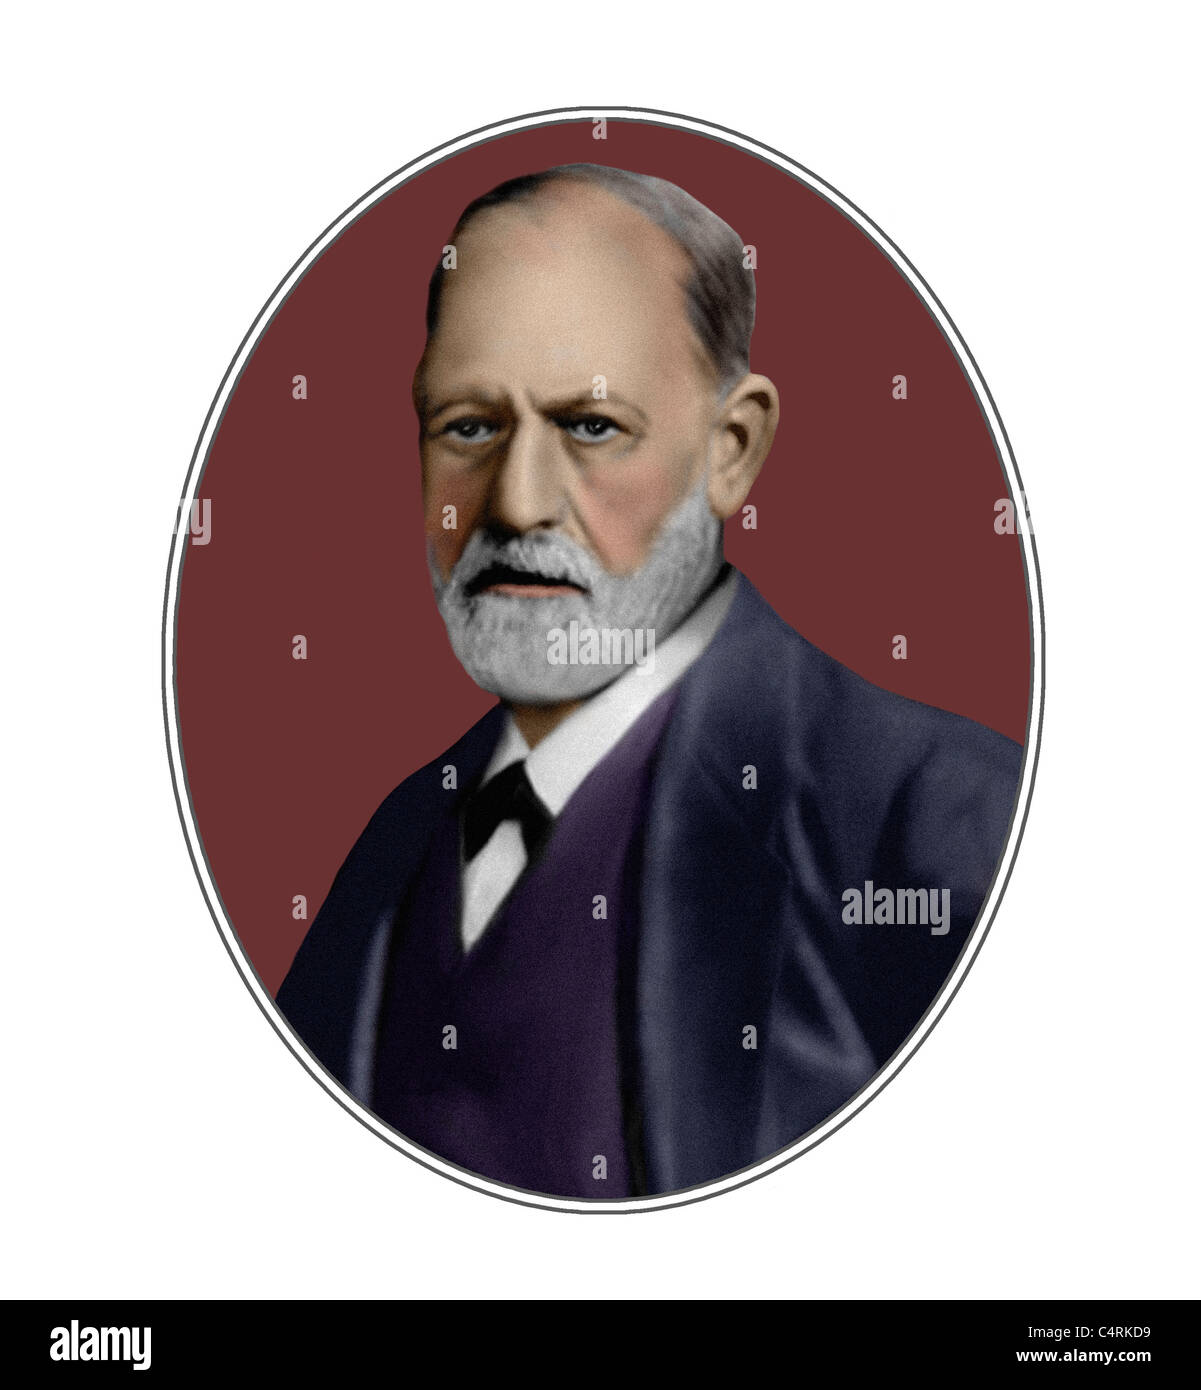 Sigmund Freud 1856 1939 Austrian Founder of Psychoanalysis Illustration - Stock Image